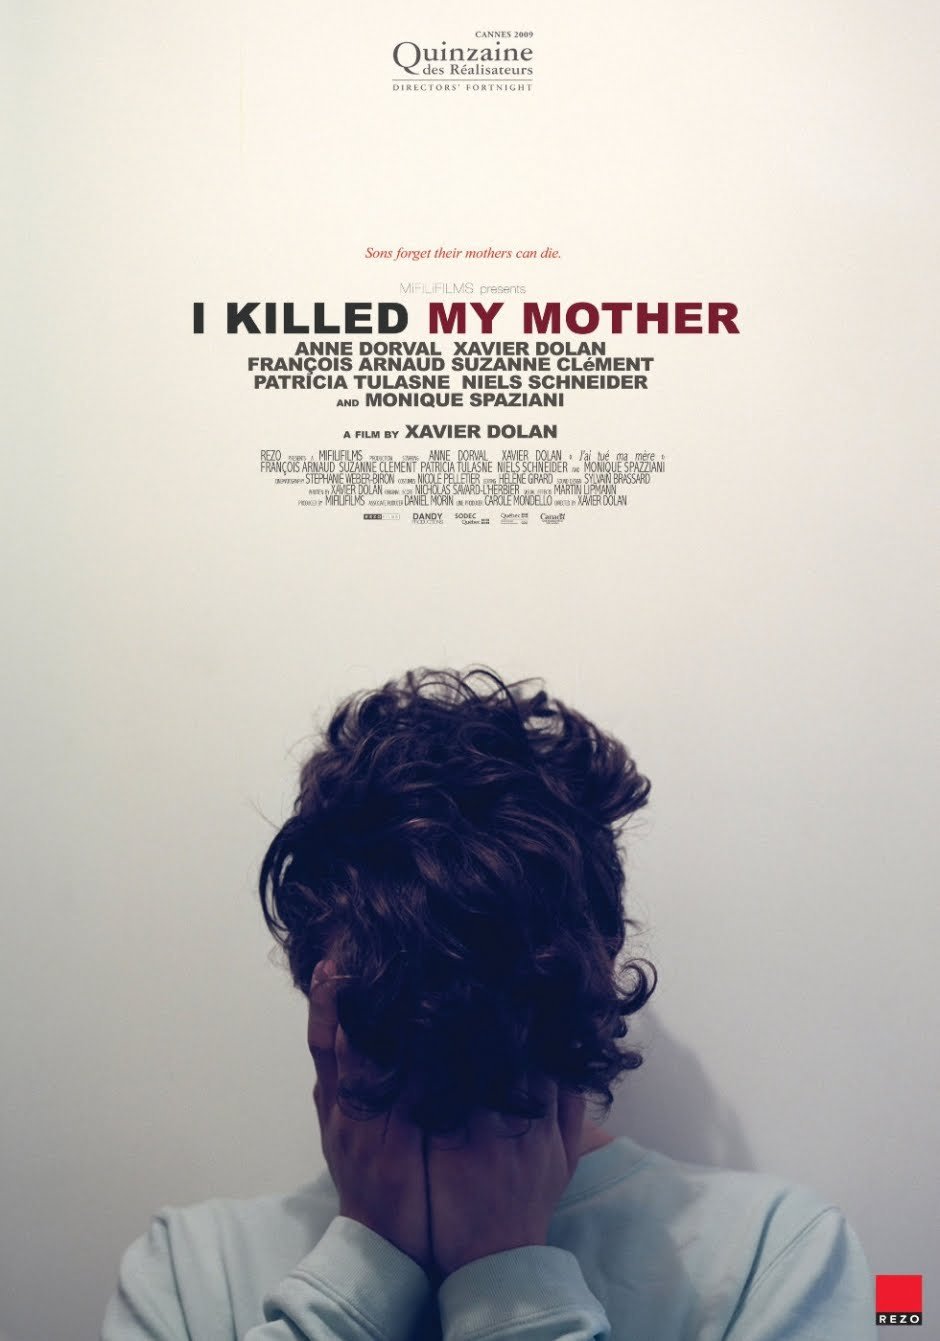 Sydney Film Festival: 10 I've already seen   A Life In Film